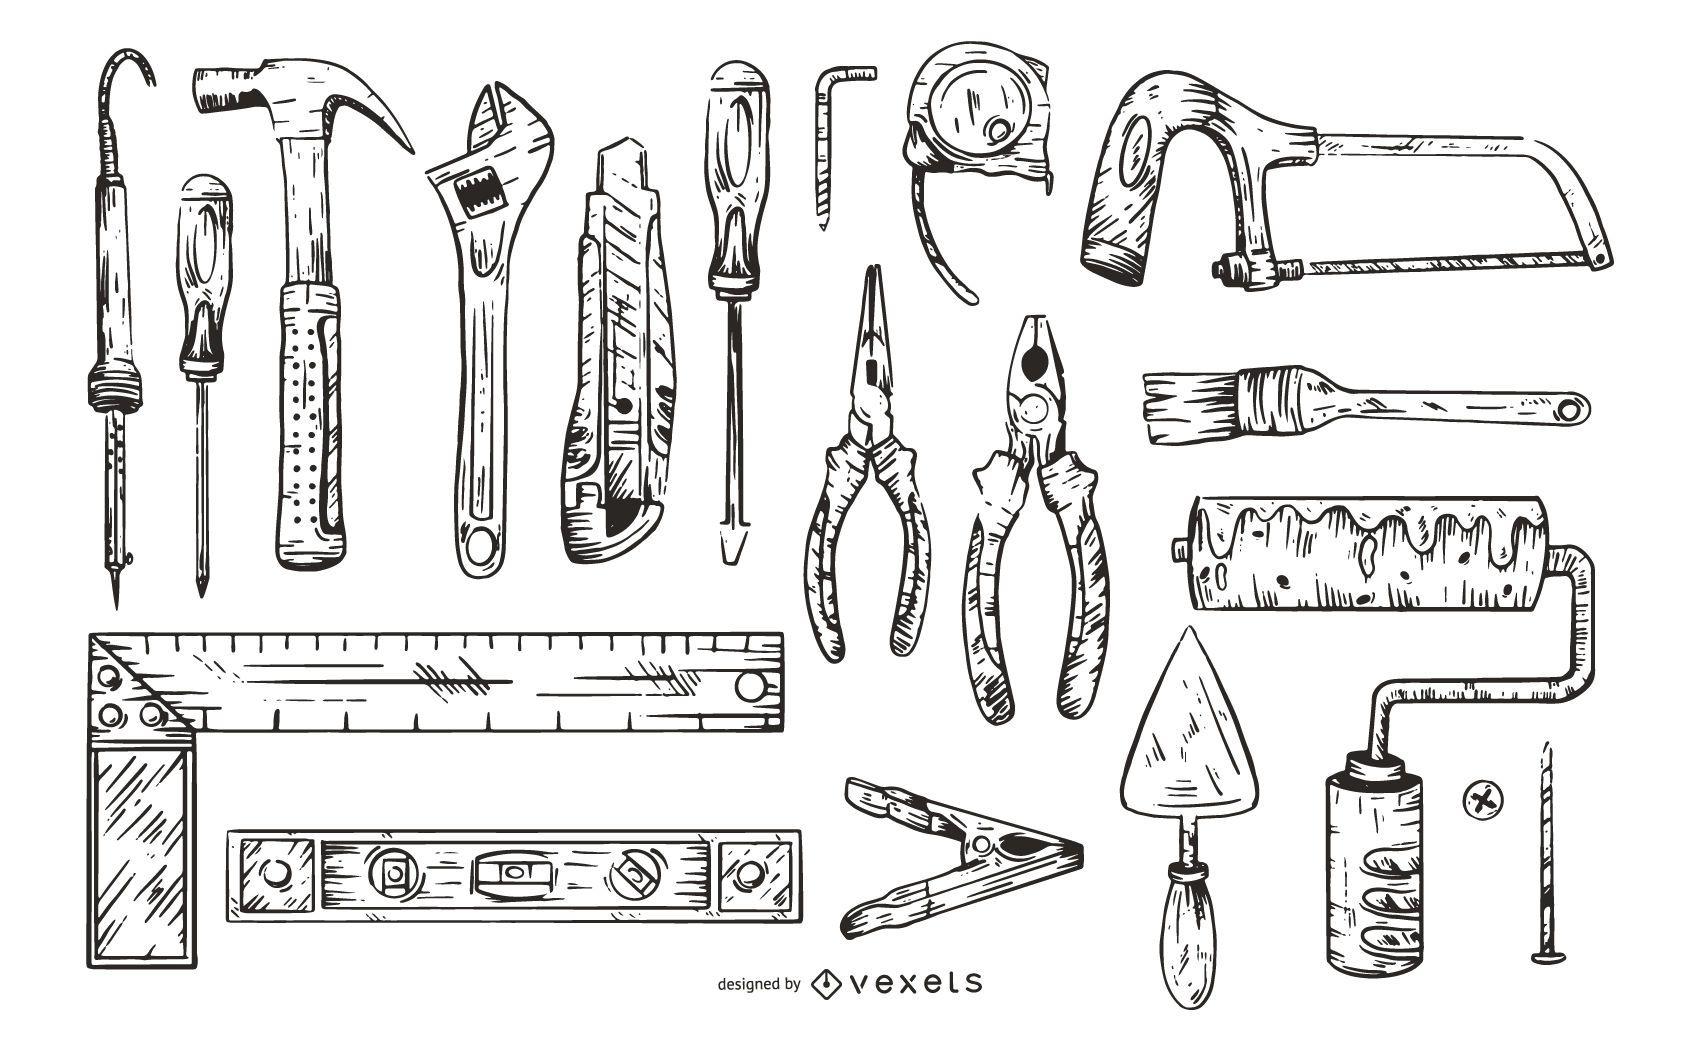 Monochrome Work Tools Illustration Pack